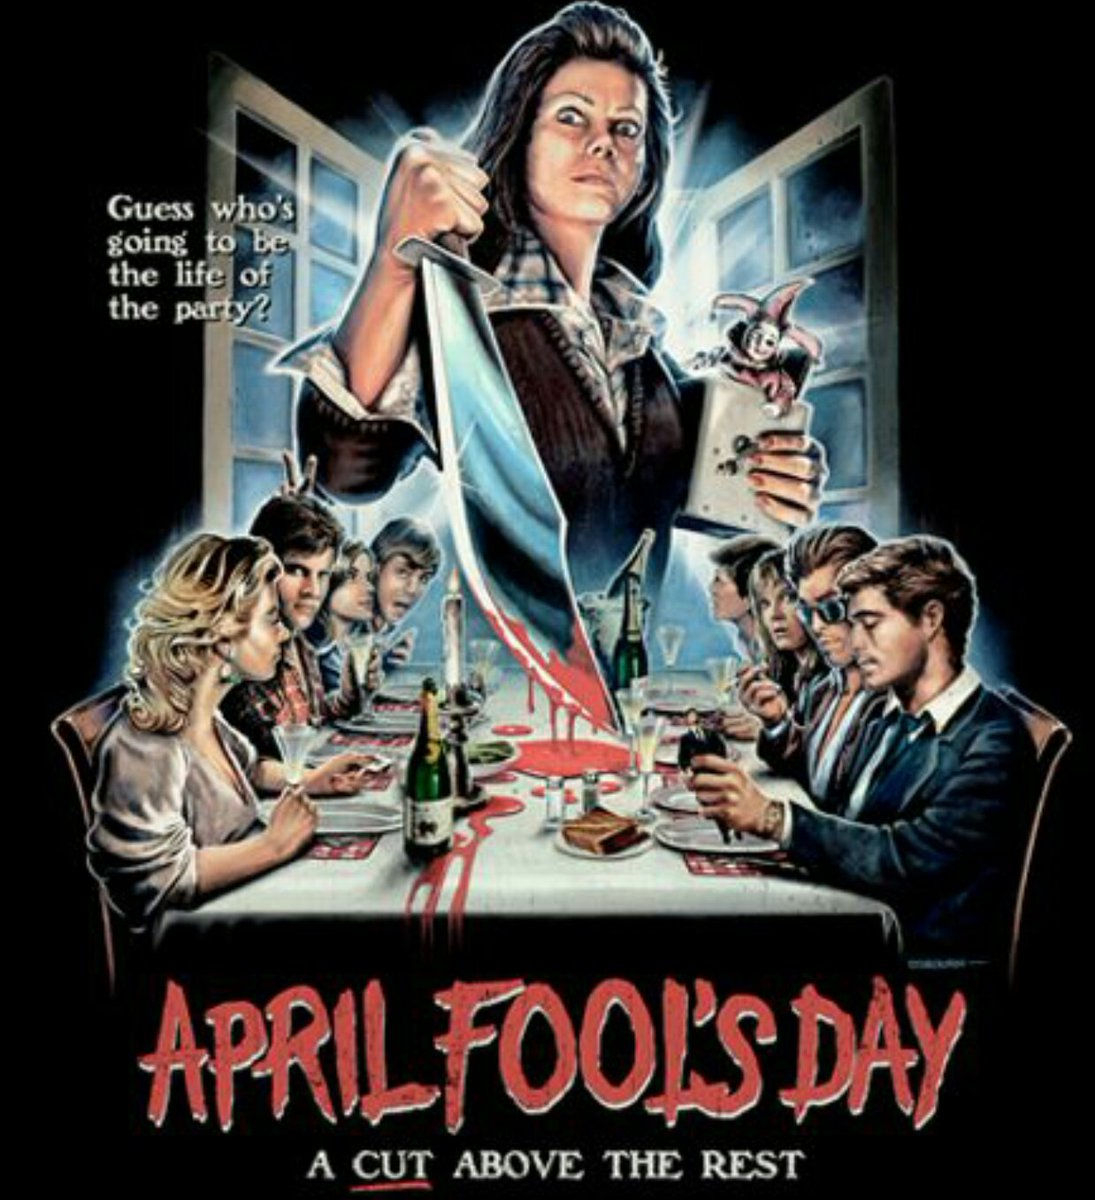 Todd Nelitz: Happy 31st bday to this gem! #aprilfoolsday #horror #horrorfan  http:// dlvr.it/NkxQfv  &nbsp;   @scottia<br>http://pic.twitter.com/rduPMQLocO